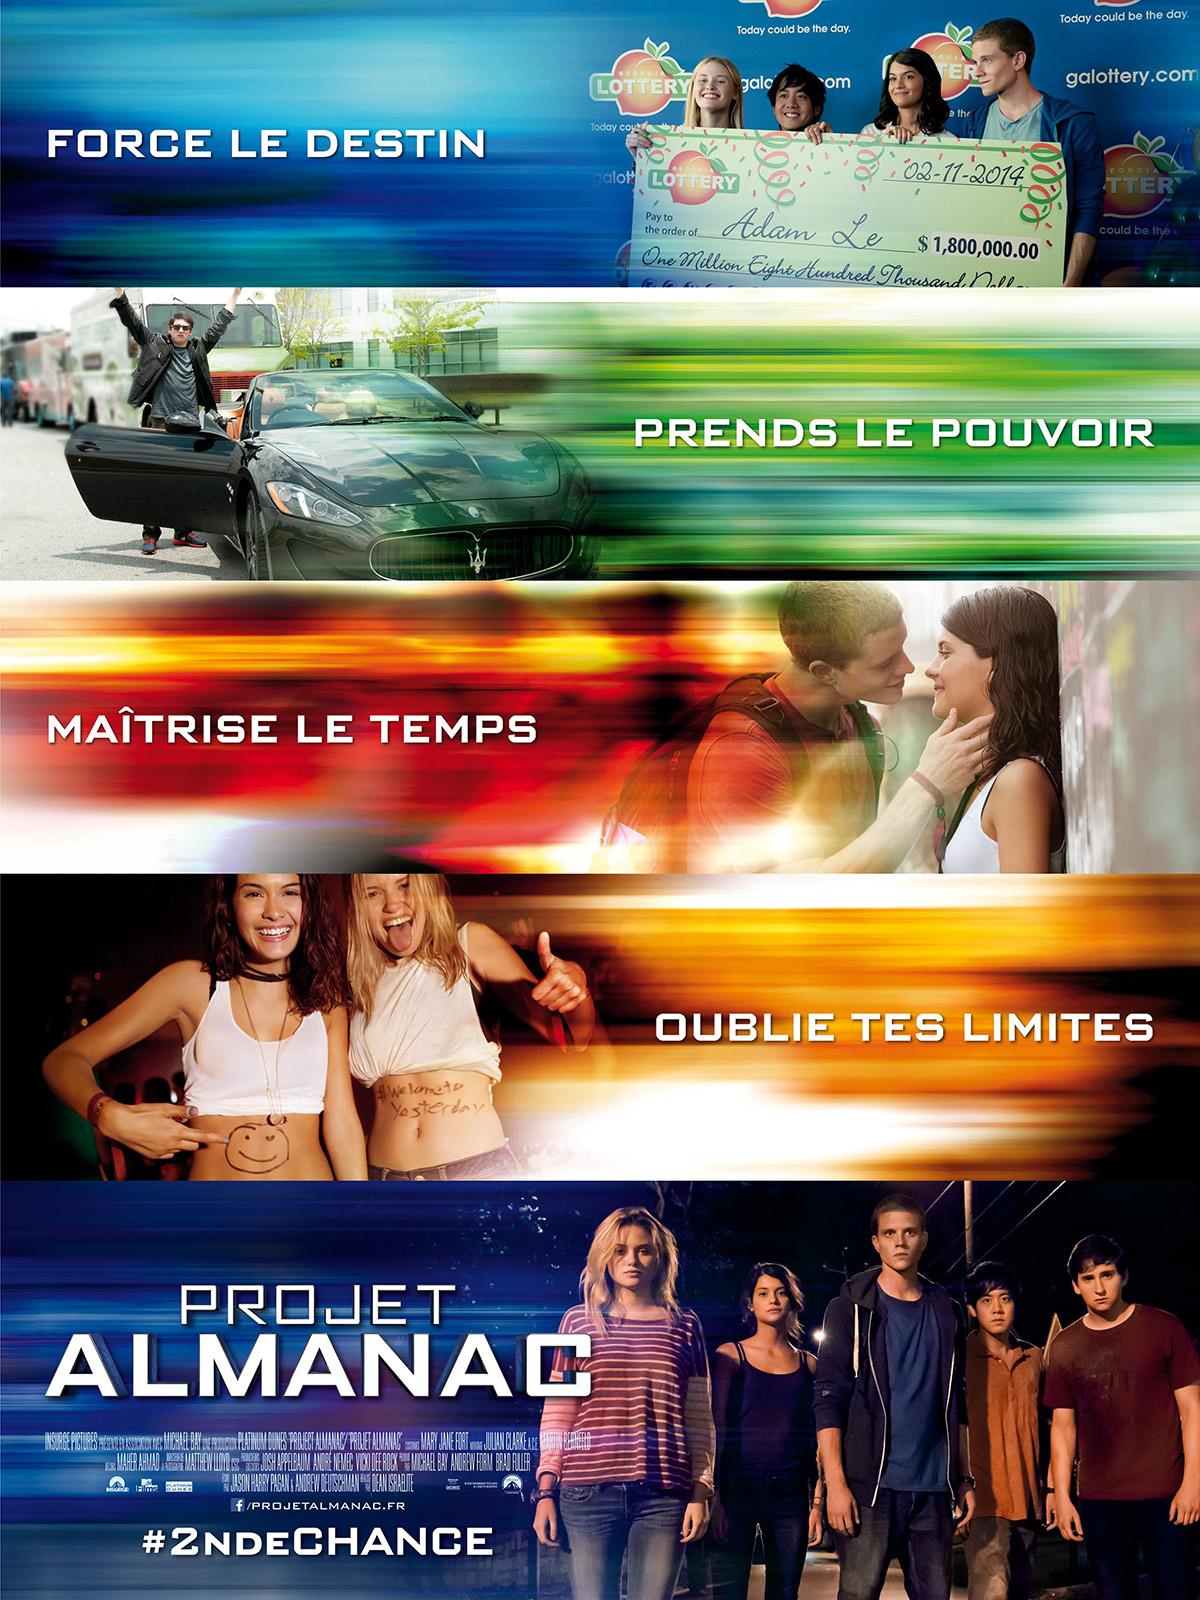 Projet Almanac